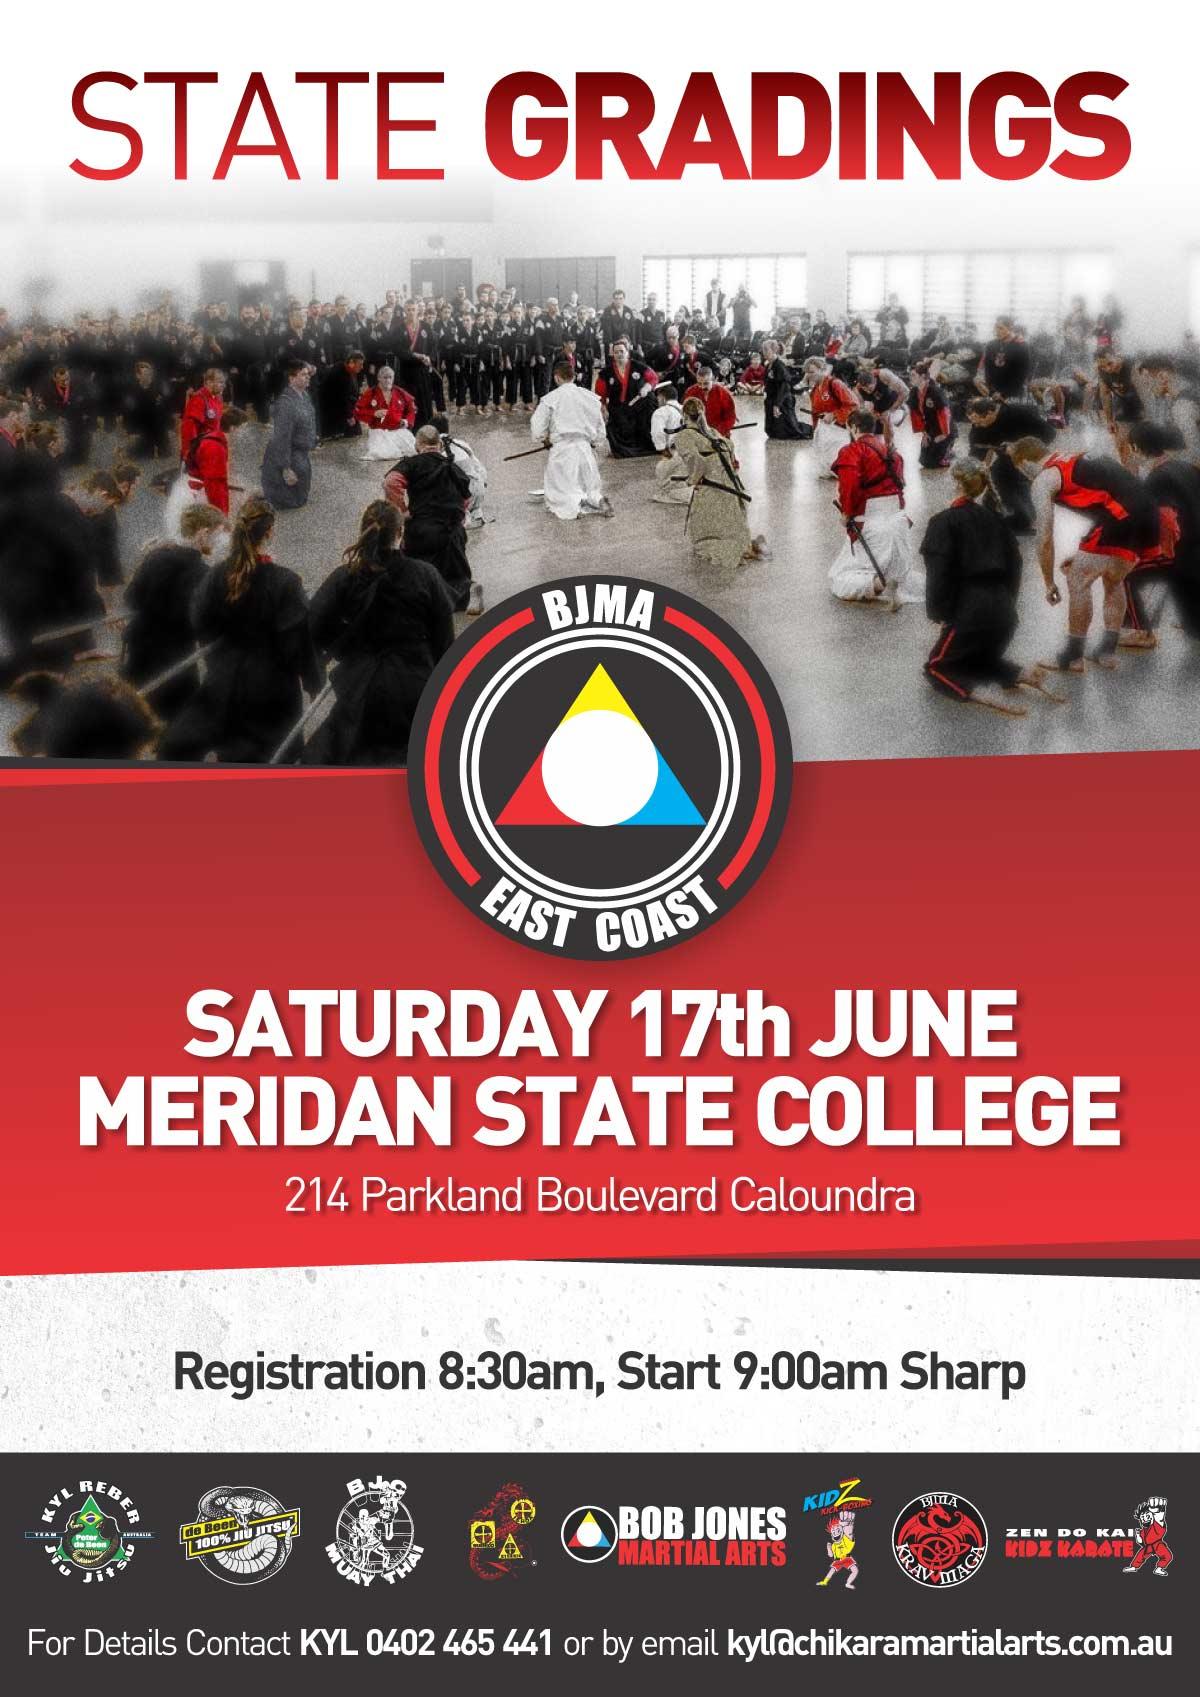 BJMA State Gradings - 17th June 2017